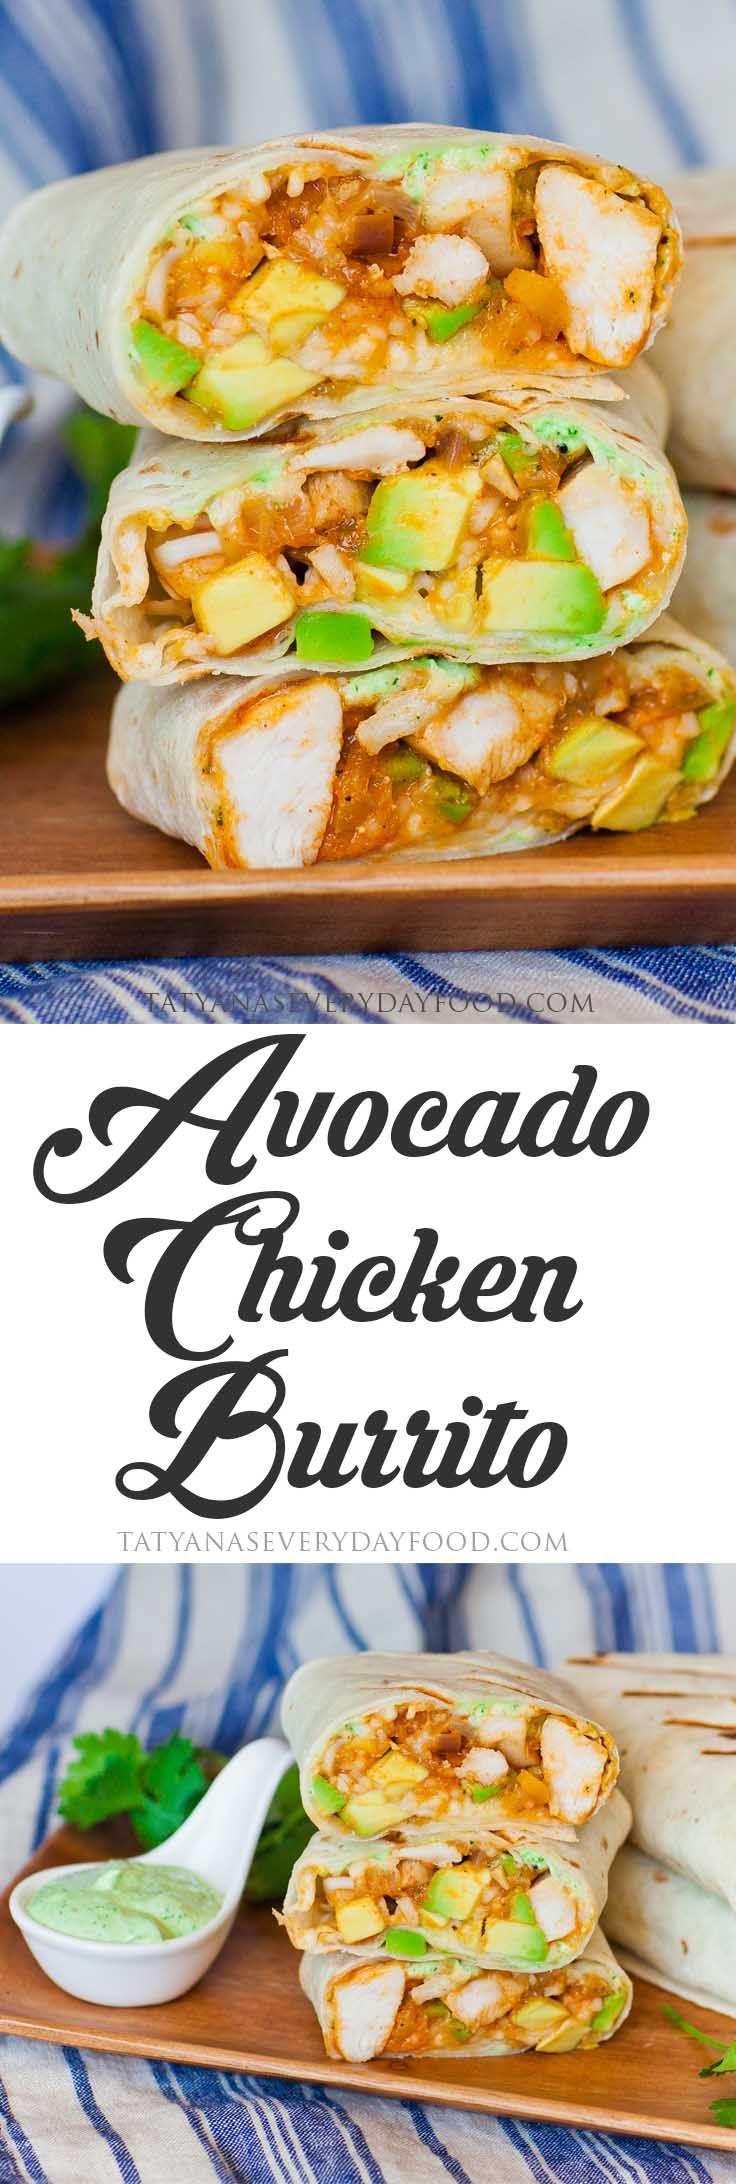 Avocado chicken burrito with cilantro sauce tatyanas everyday food avocado chicken burrito with cilantro sauce tatyanas everyday food forumfinder Gallery